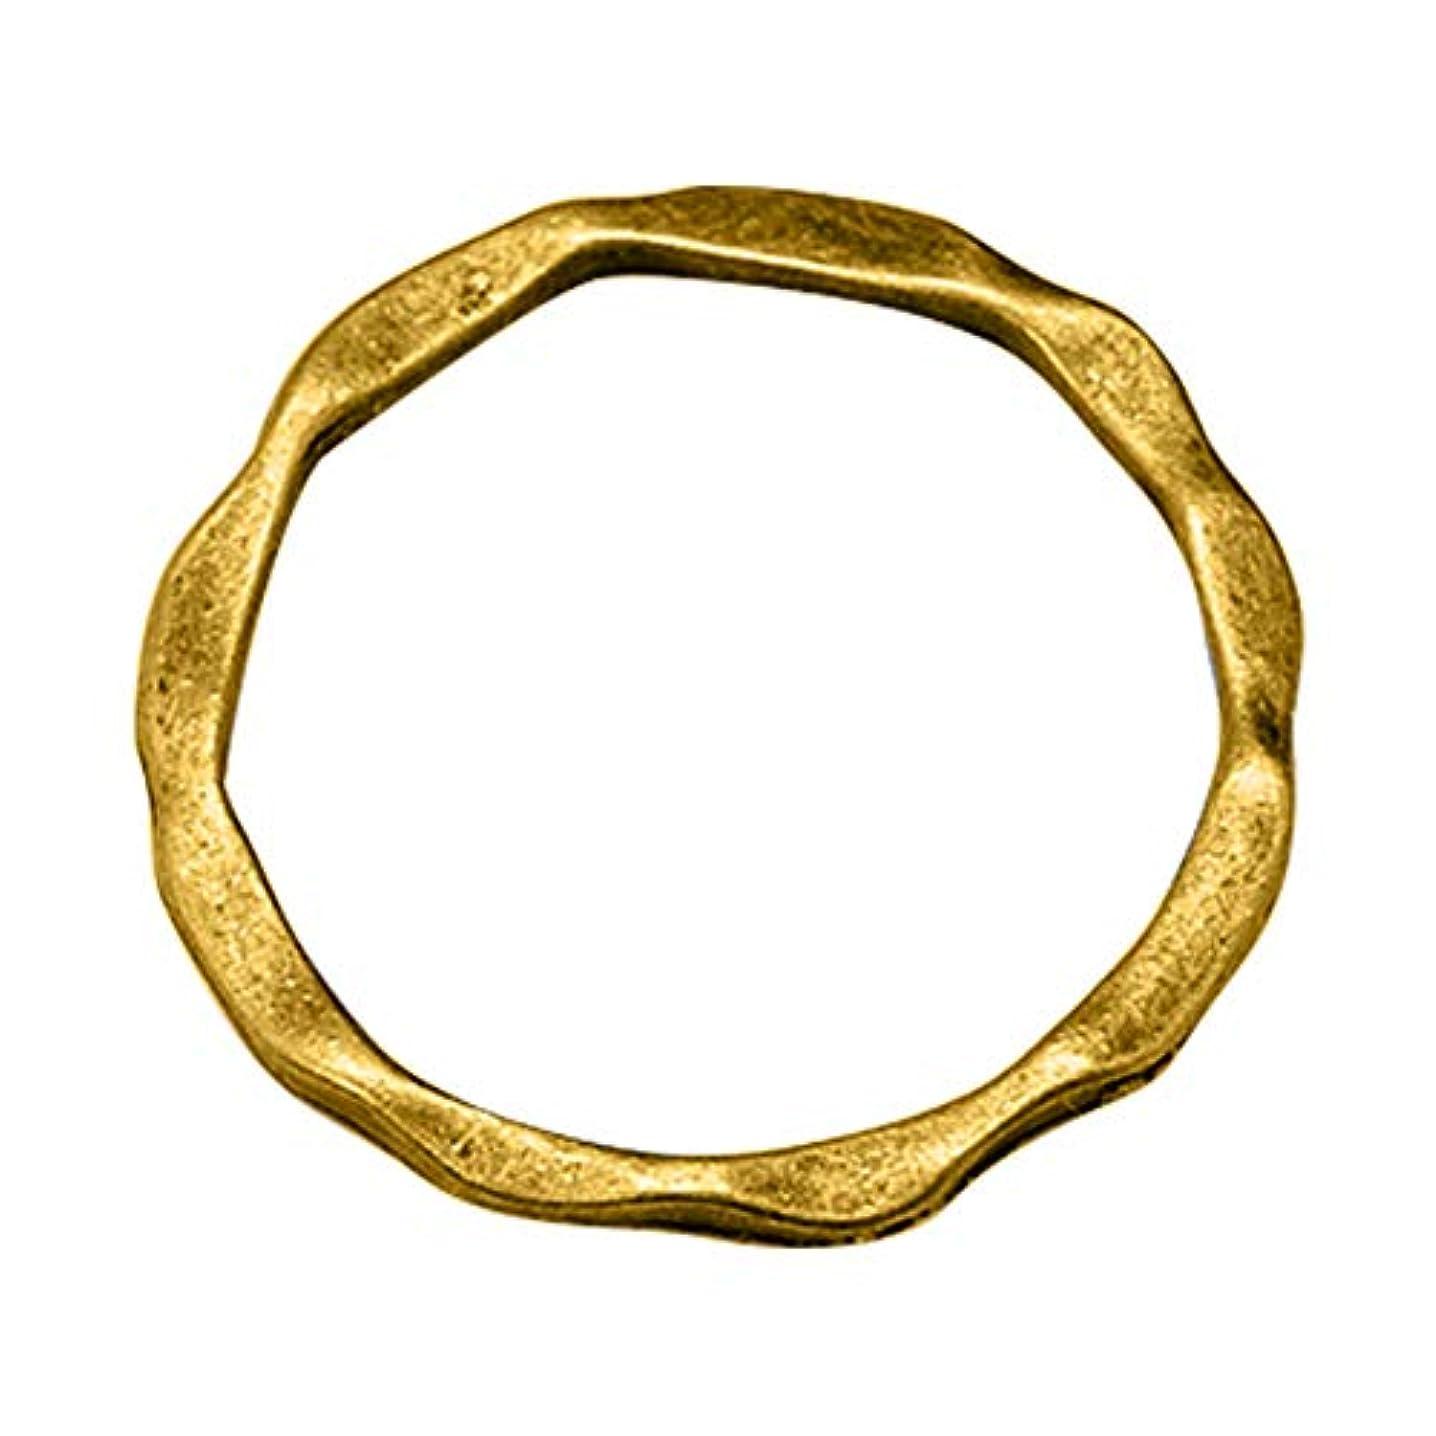 PH PandaHall 500pcs Alloy Linking Rings Antique Golden Circle Frames Tibetan Style Ring Circle Pendant for Necklace Dangle Earring Making